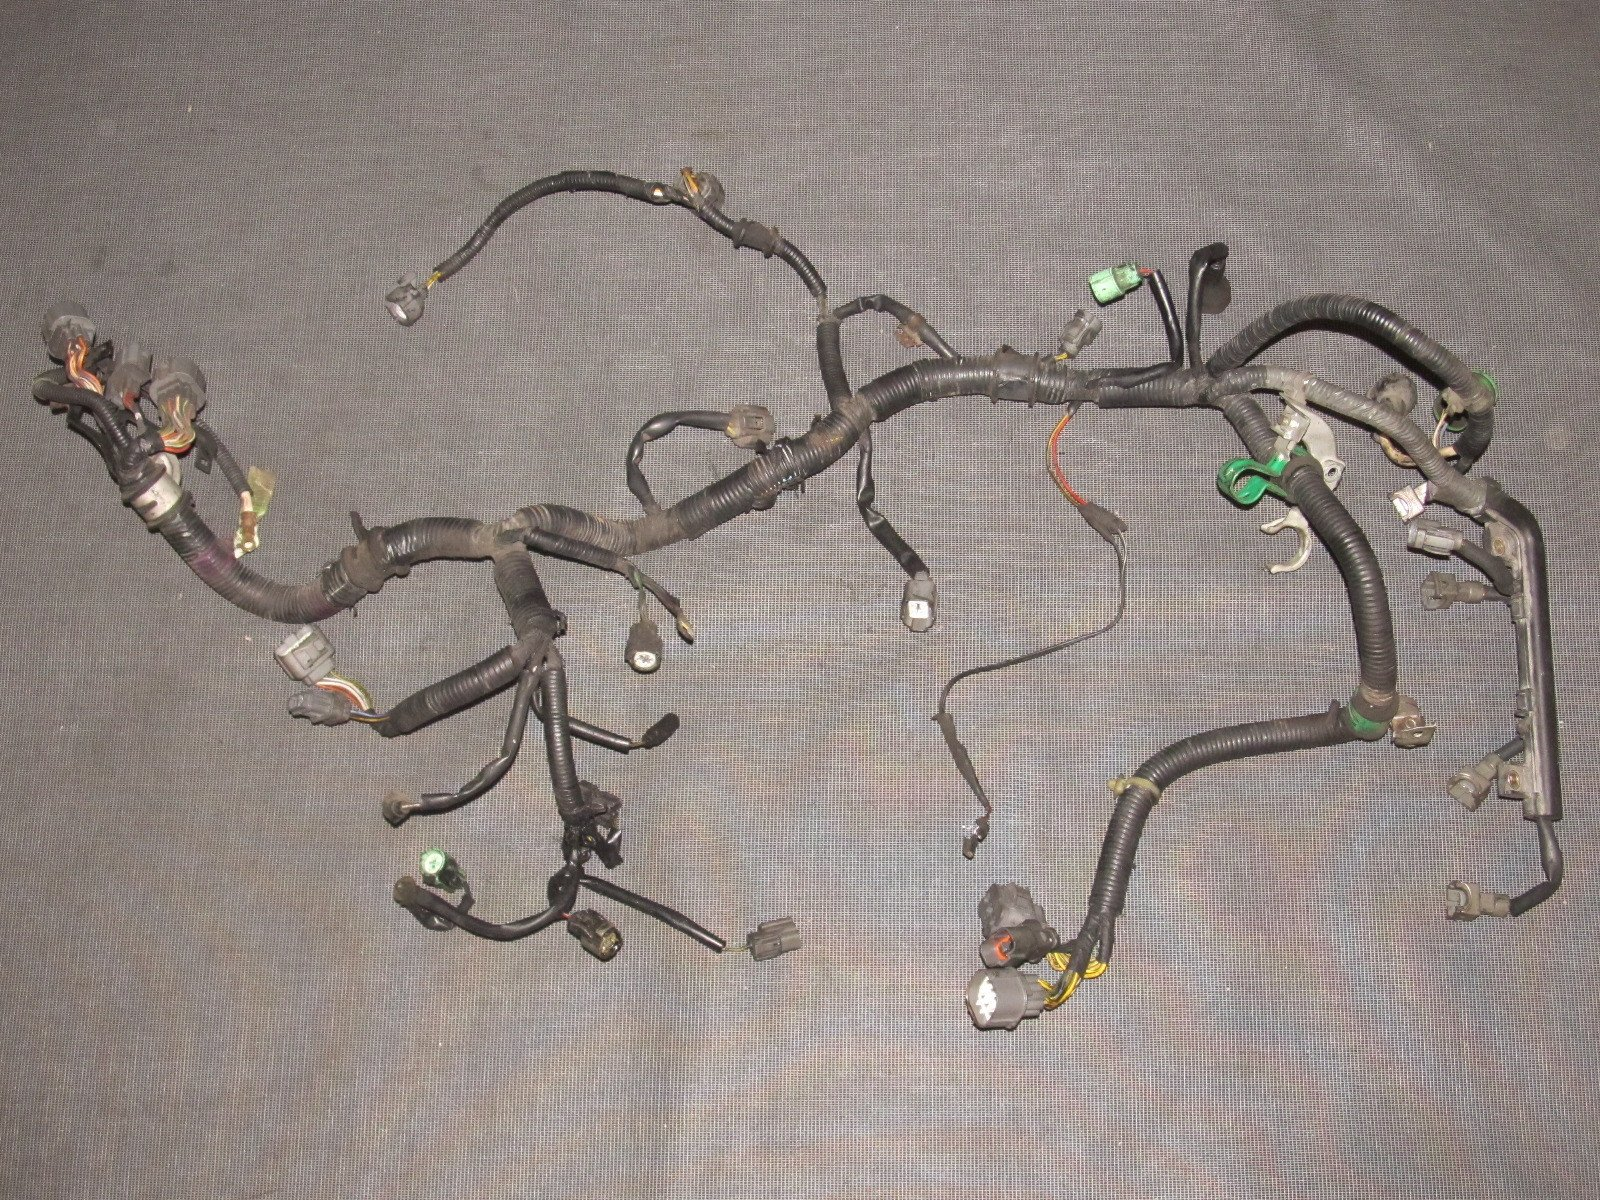 b18c wiring harness b18c wiring harness wiring diagrams posts  b18c wiring harness wiring diagrams posts